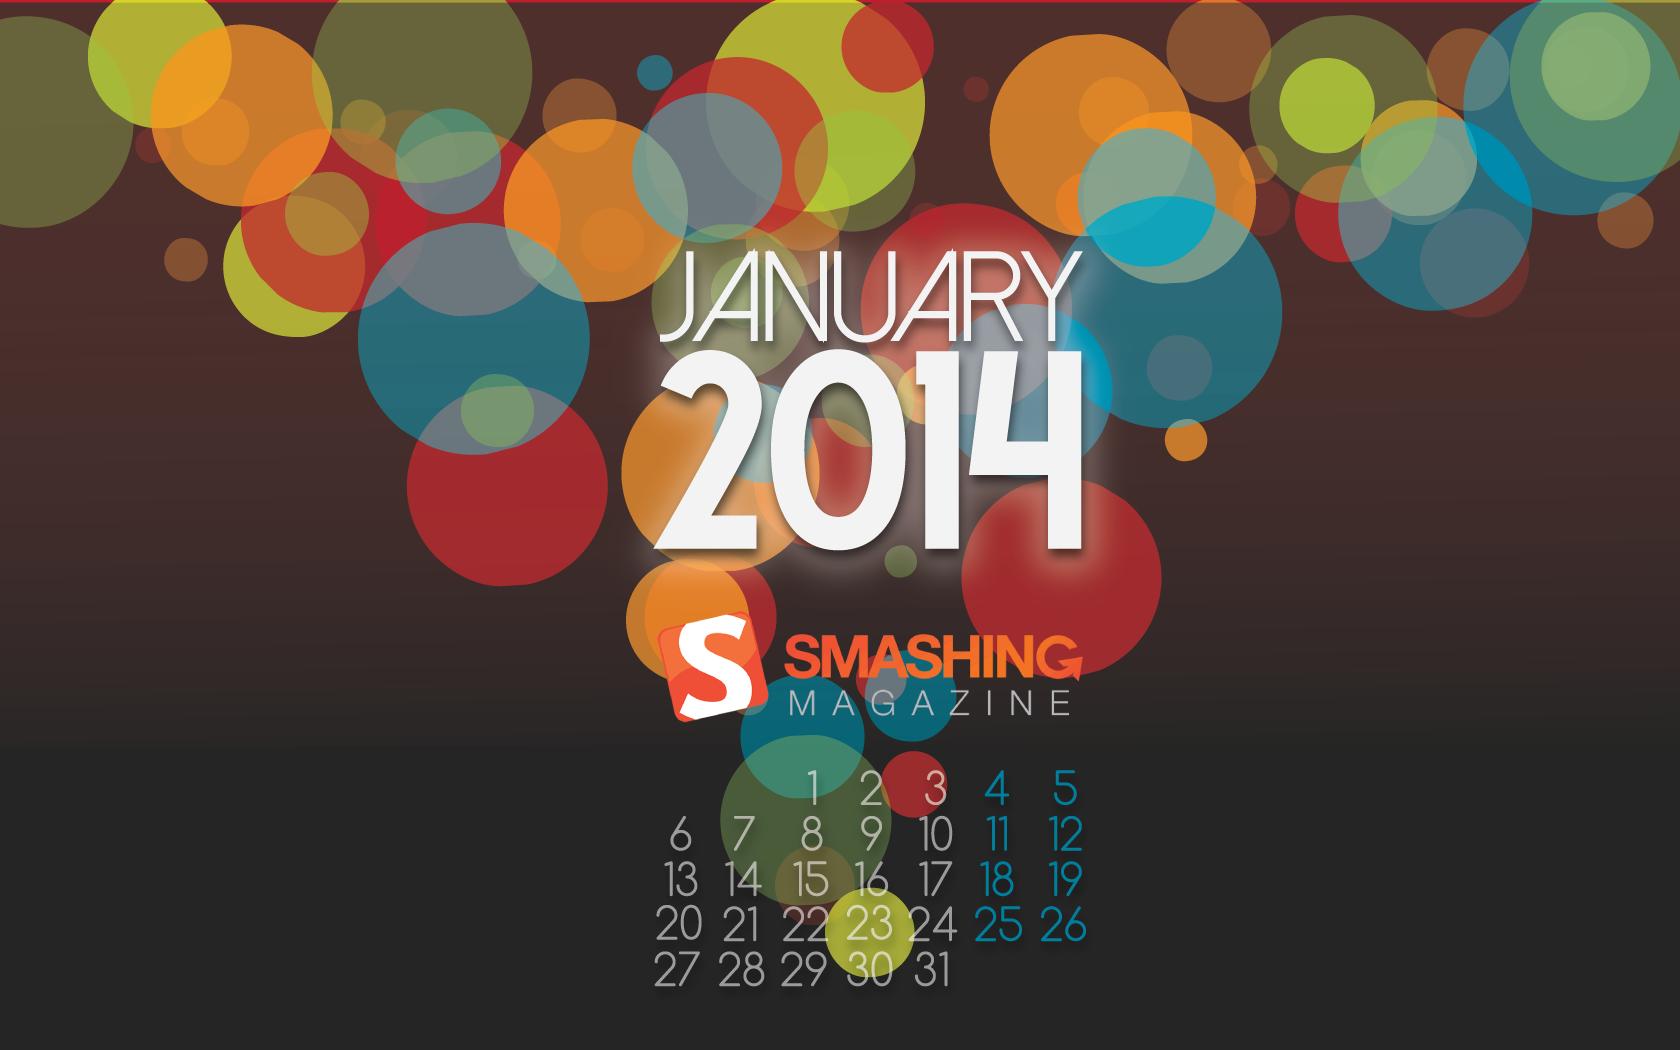 Desktop Wallpaper Calendars January 2014 Smashing Magazine 1680x1050